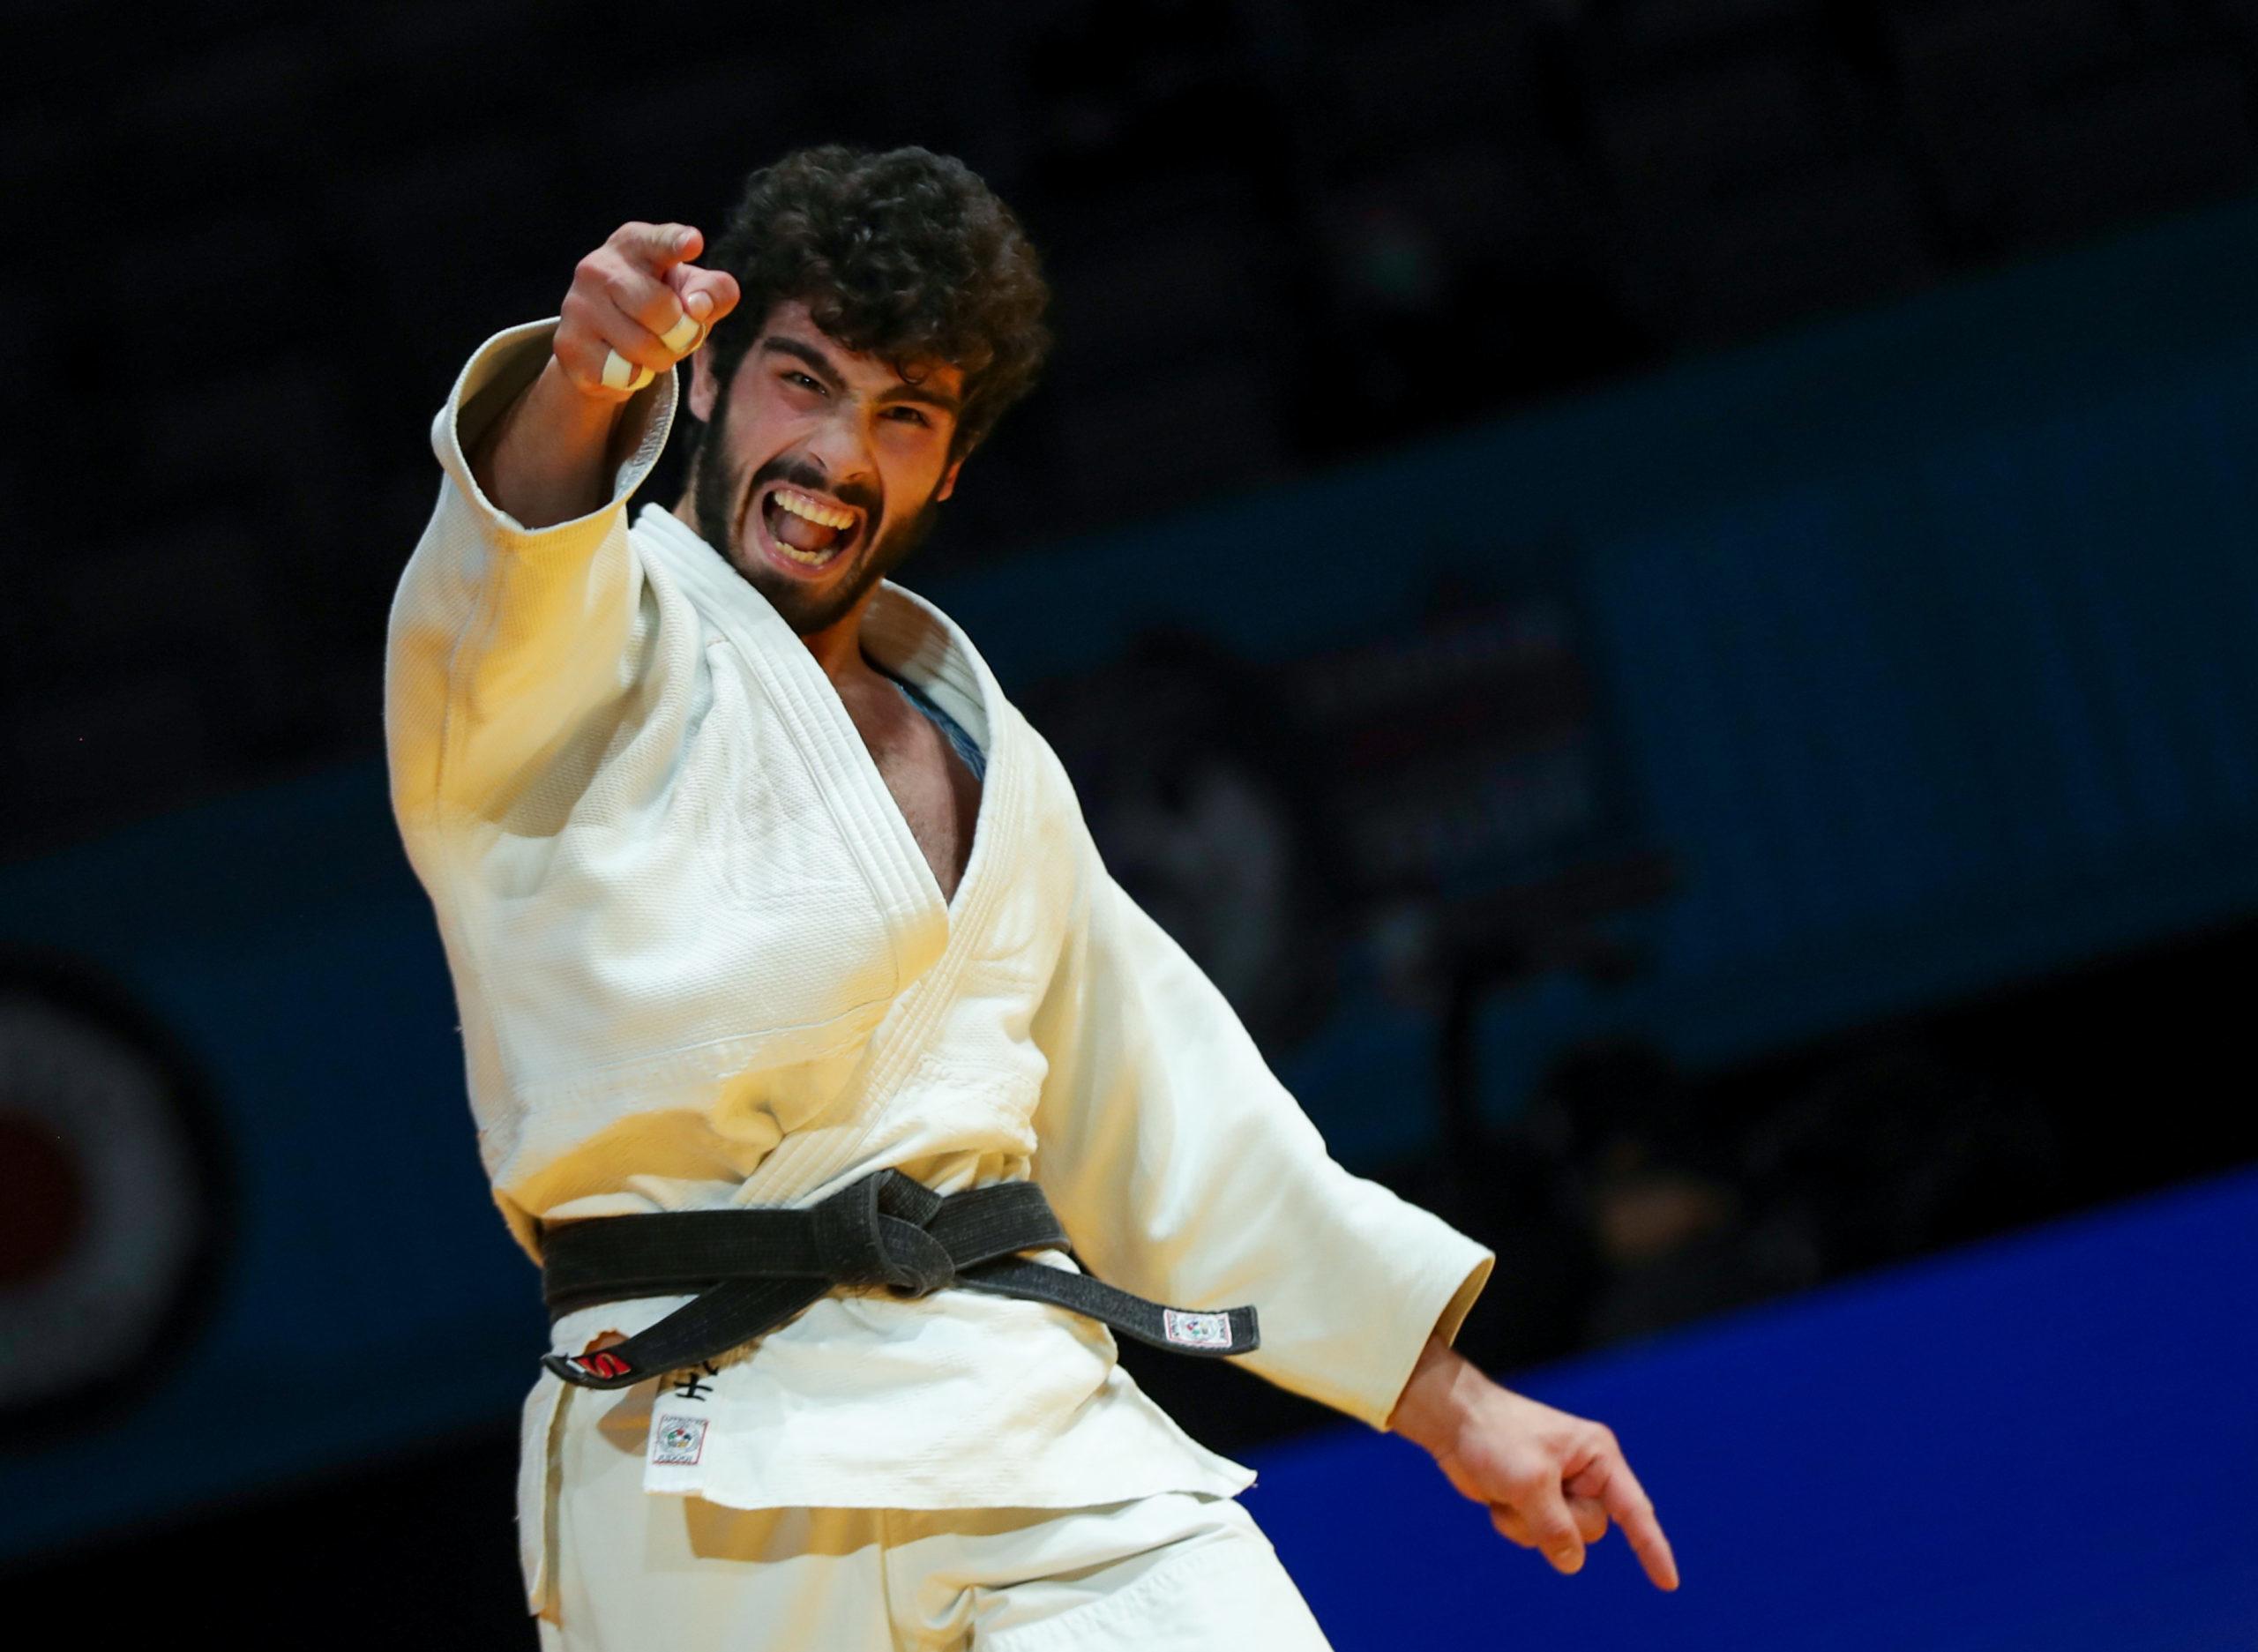 Tato Grigalashvili won European Championships